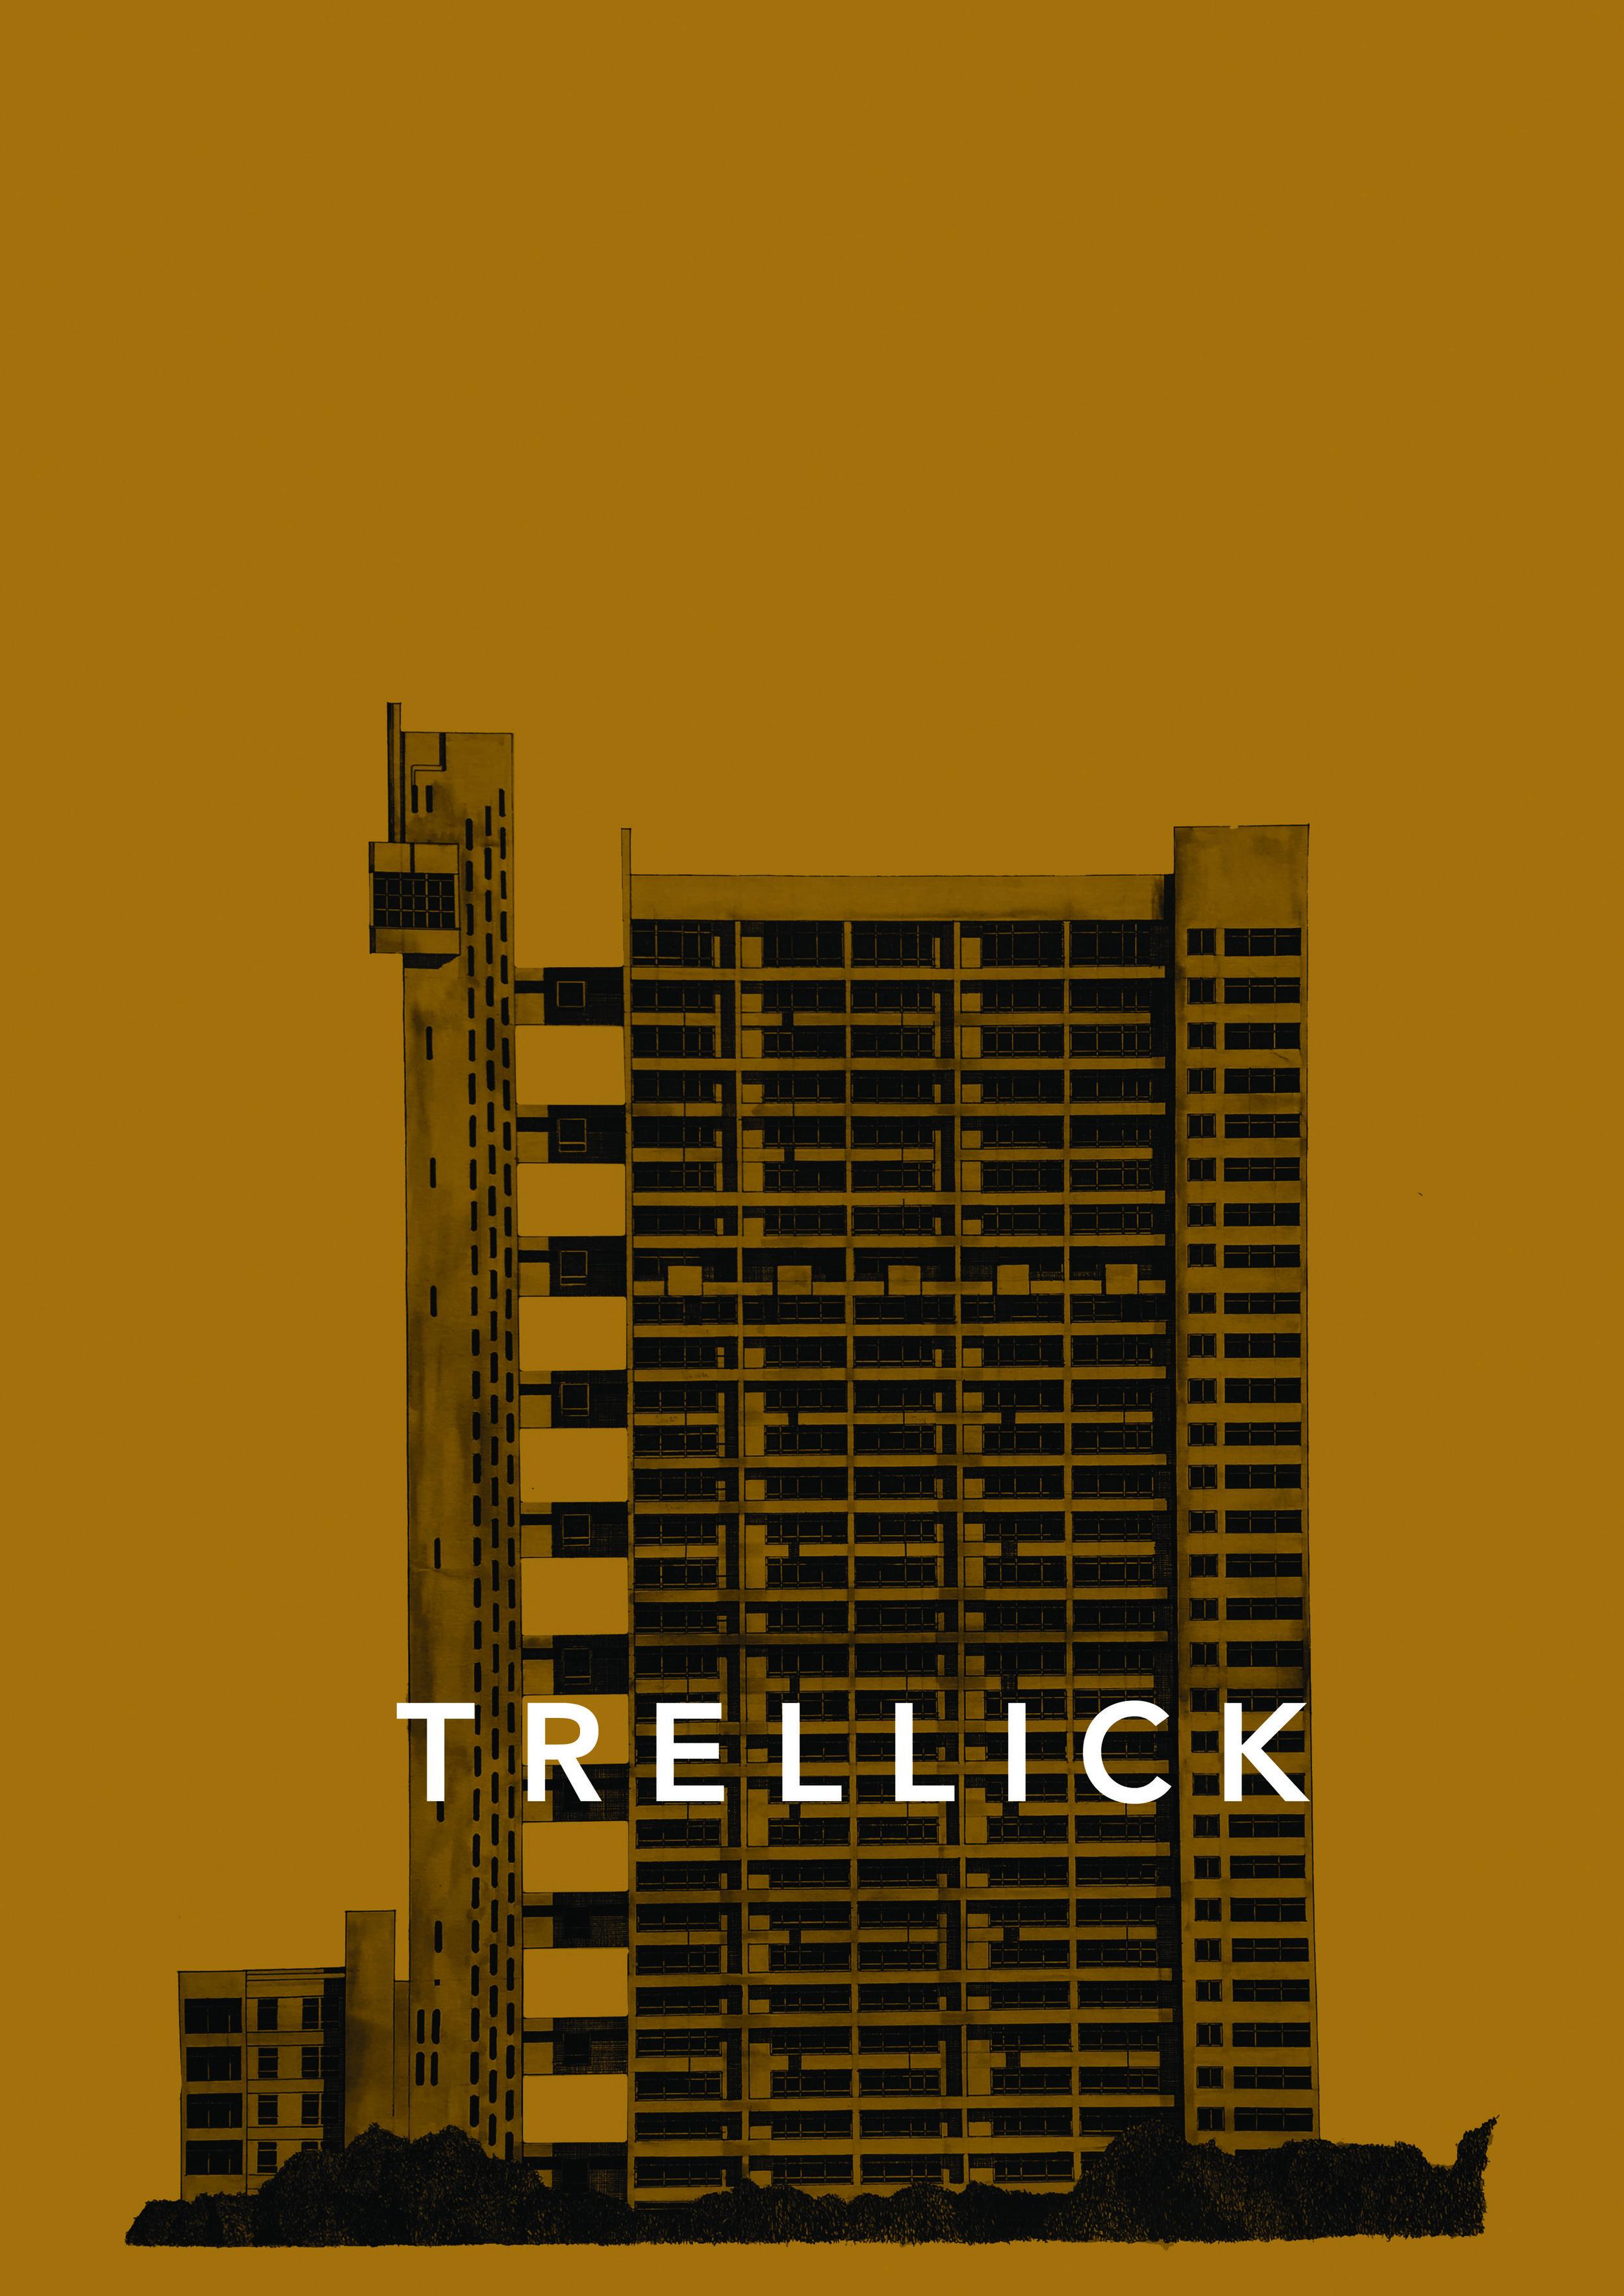 Trellick Tower. London